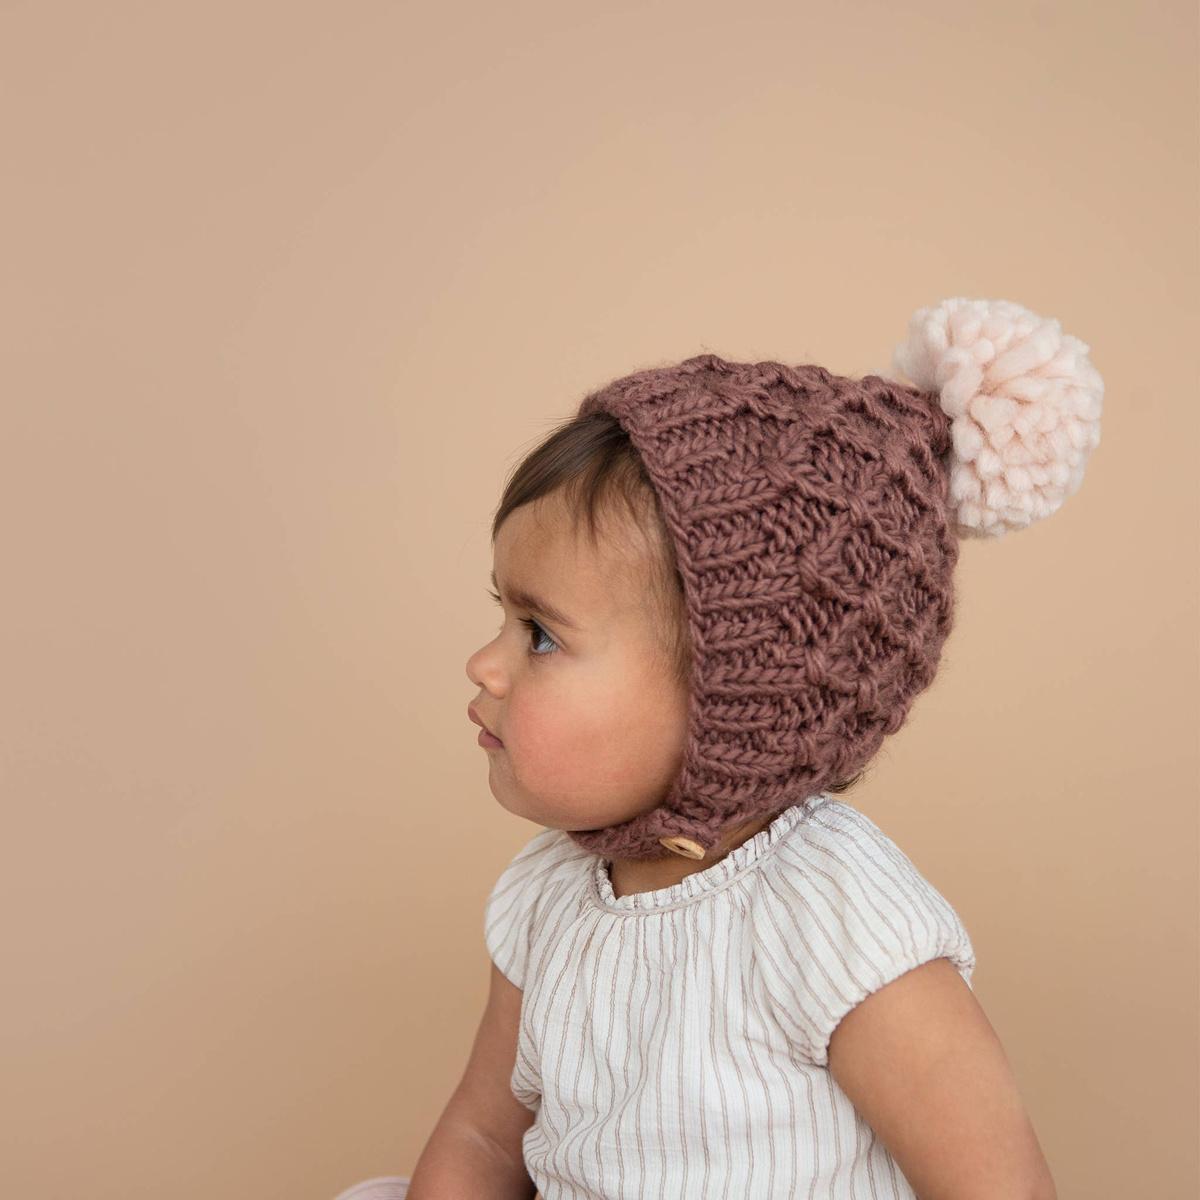 The Blueberry Hill - BH Libby Knit Bonnet, Mauve + Pink, 12-24 month